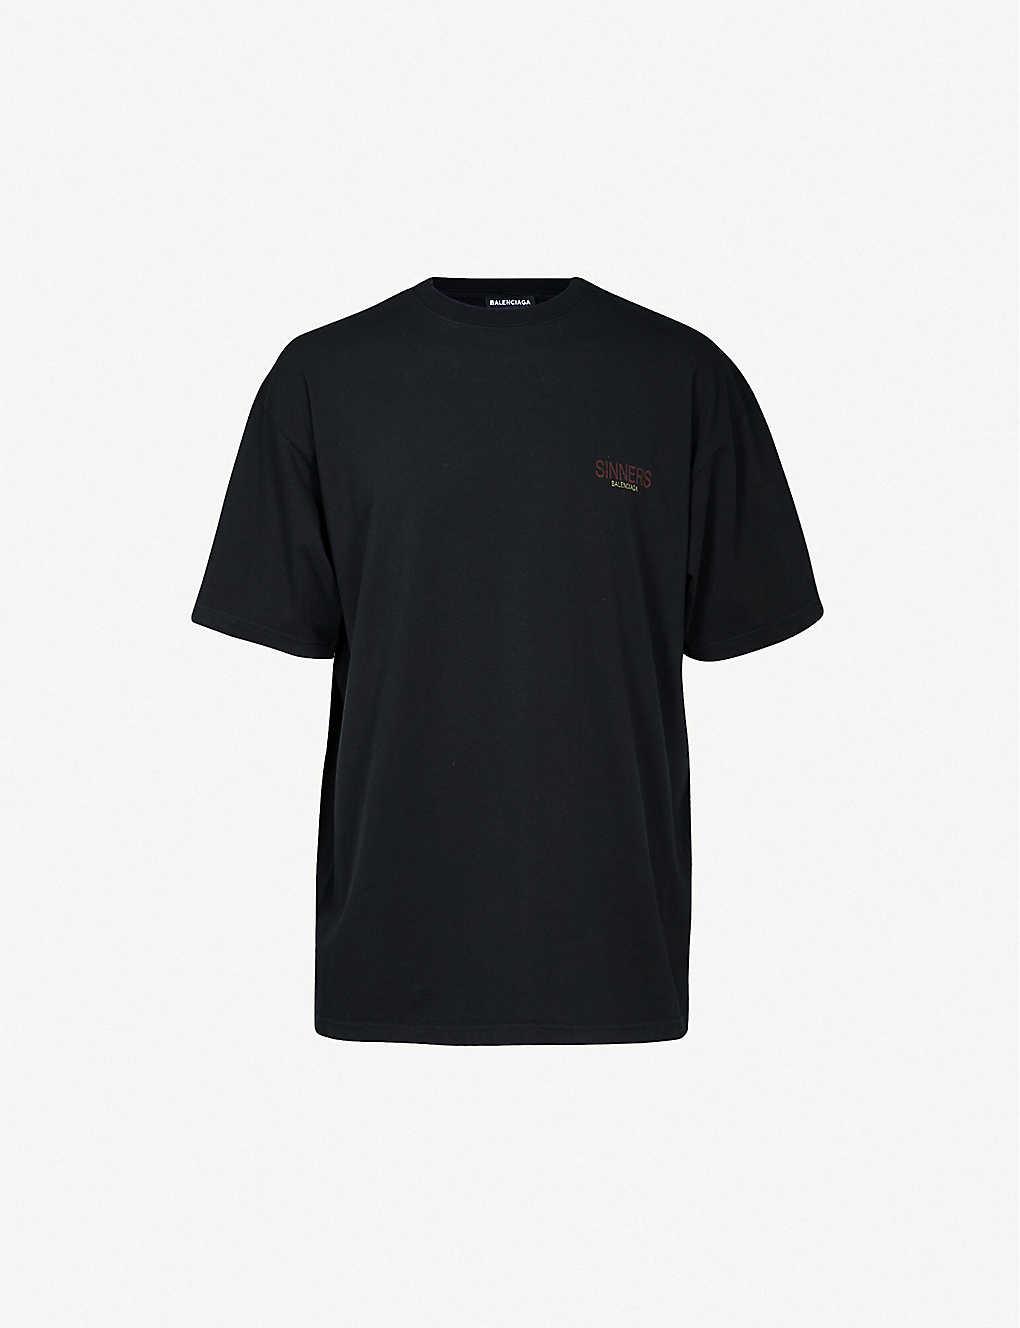 29b9daf2baba BALENCIAGA - Sinners-print cotton-jersey T-shirt | Selfridges.com